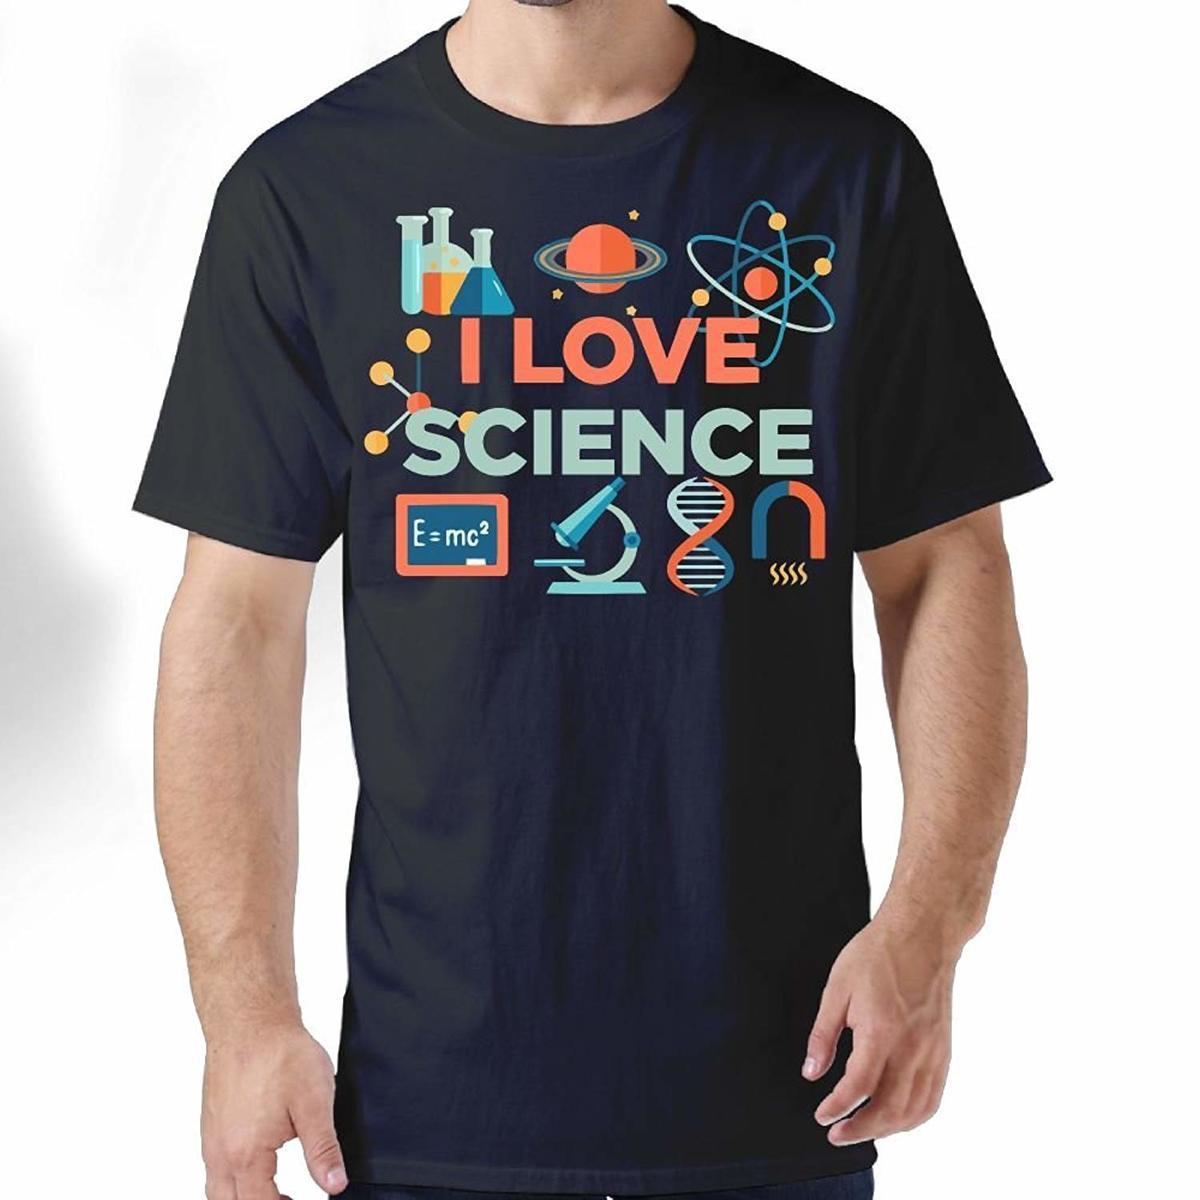 5b595a4fa Summer Men'S Short Sleeve T Shirt I Love Science Chemistry Formula Graphic  Crewneck Tees Top Short Fashion Normal Mens Print T Shirt T Shirt Making T  Shirts ...